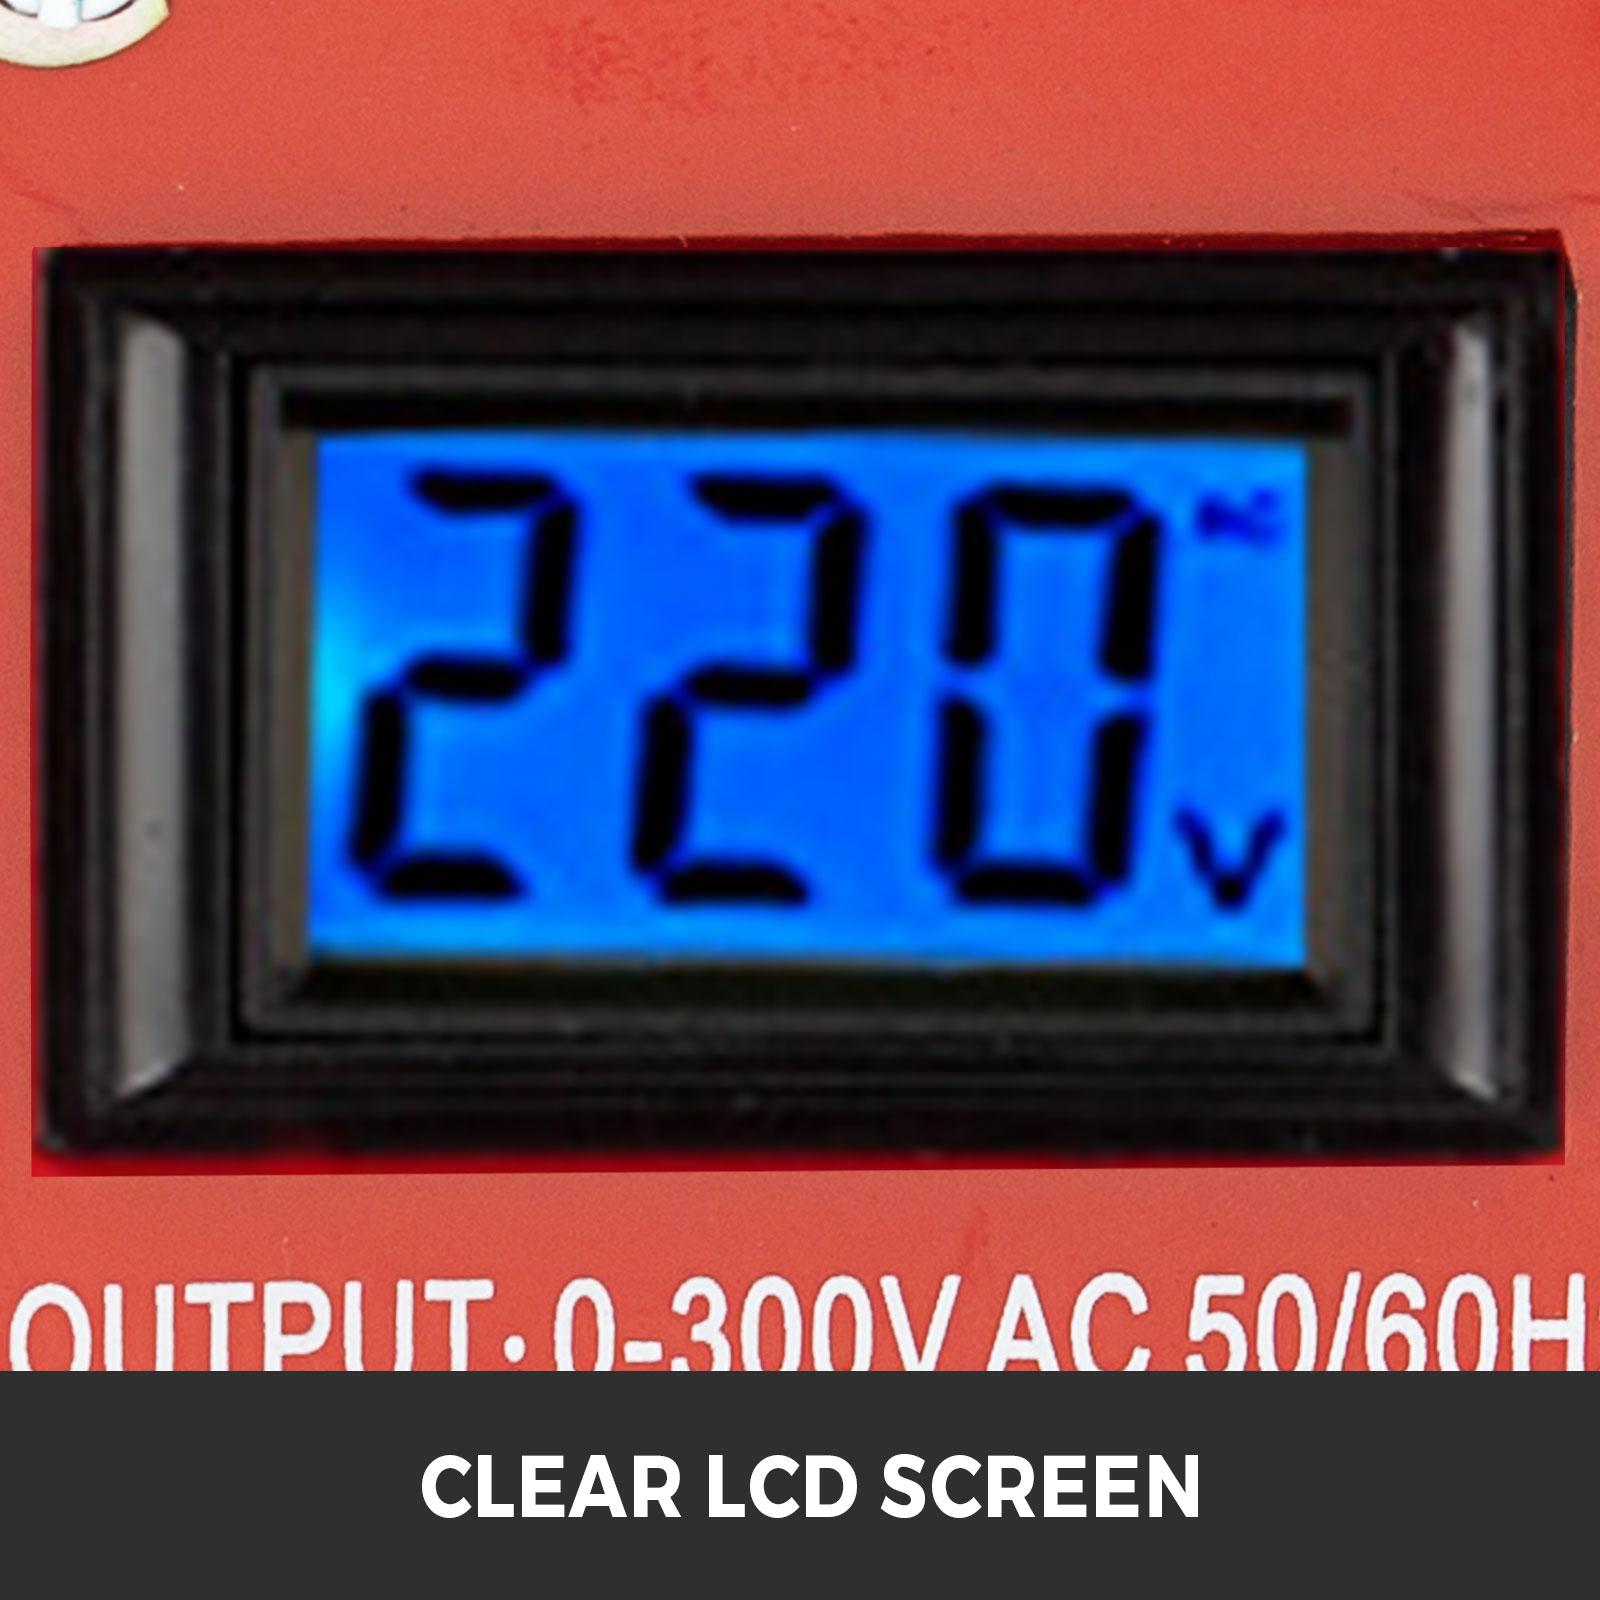 Auto-Variac-Variable-Transformer-0-5-1-2-3KVA-Regulator-pure-copper-coil-220V thumbnail 28